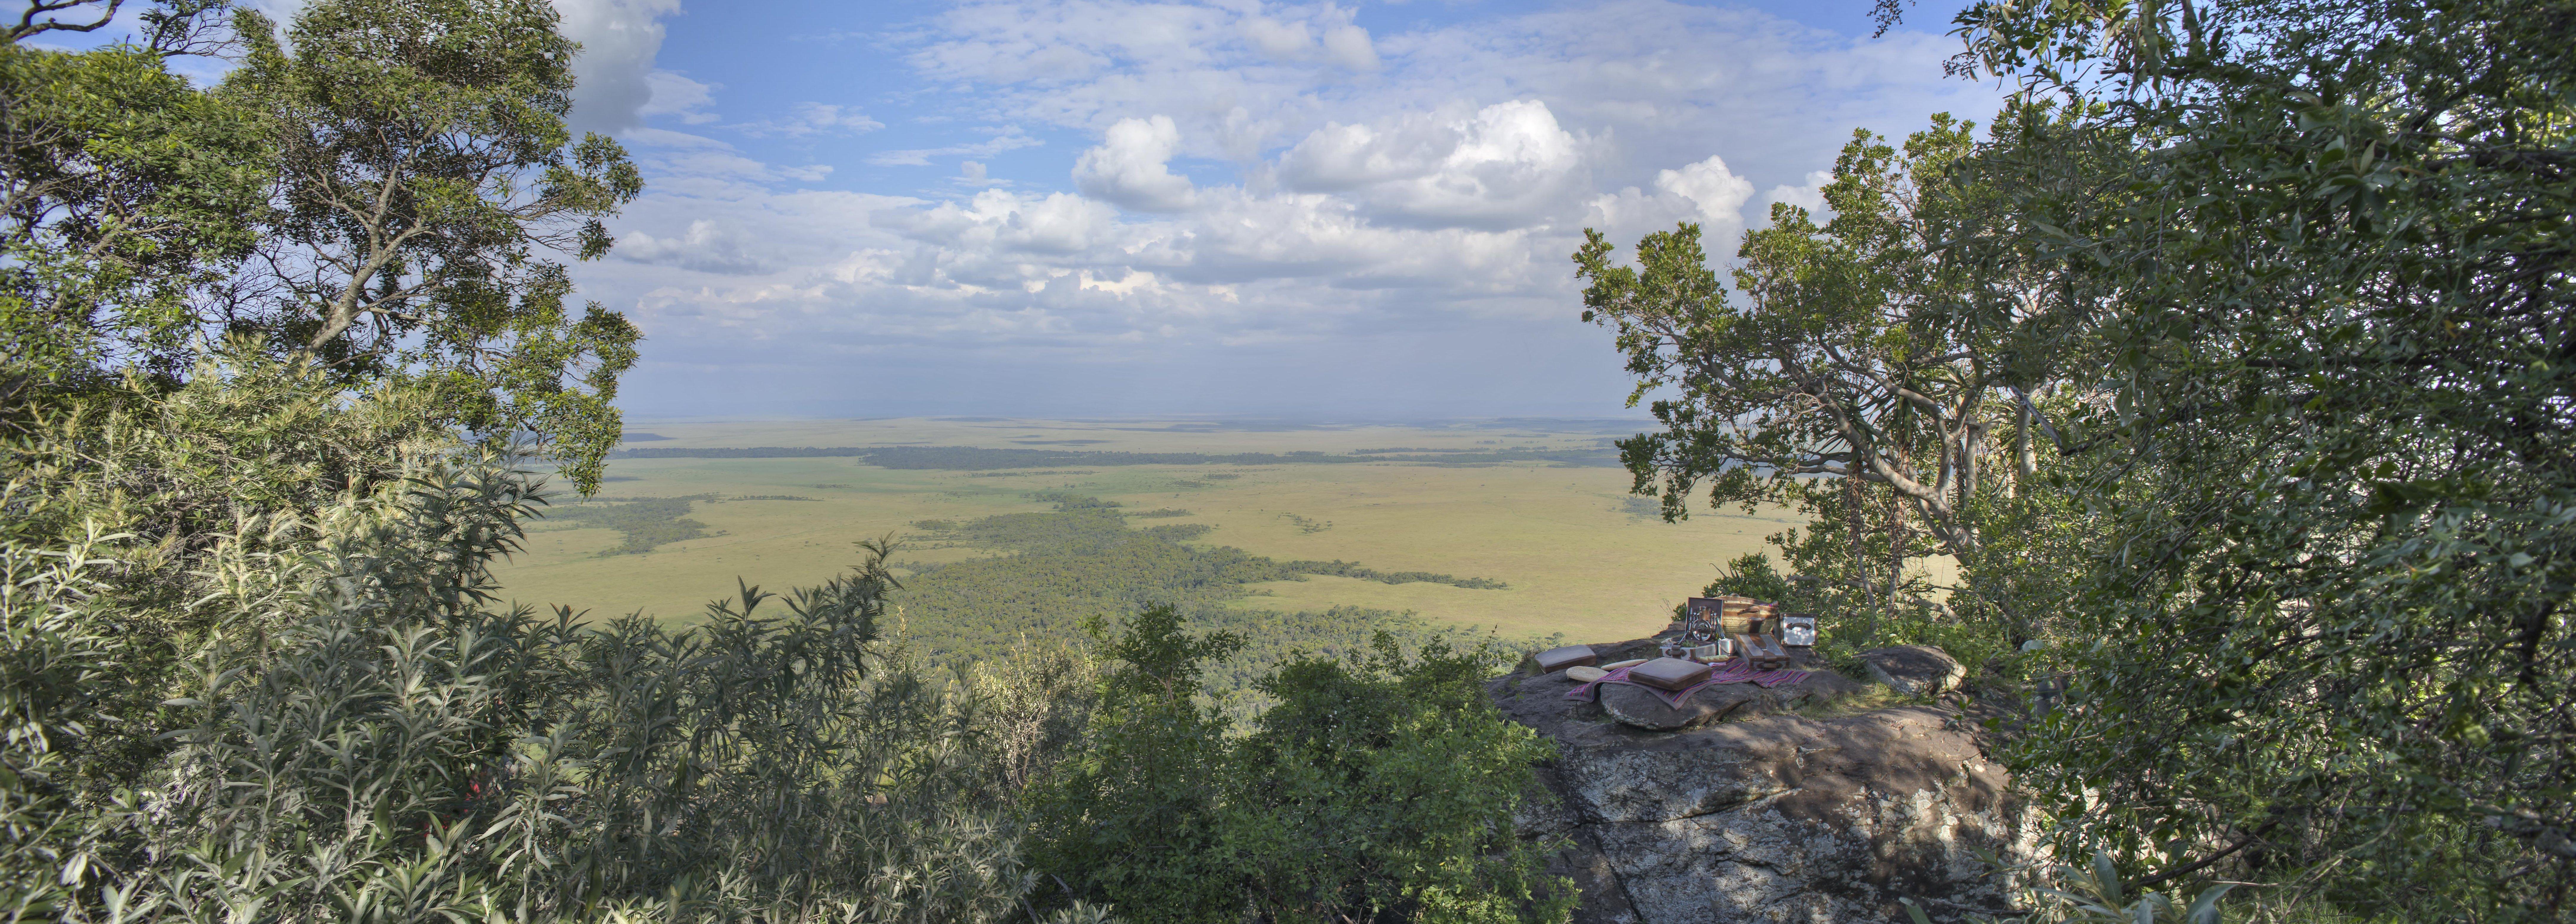 maasai-mara-panorama